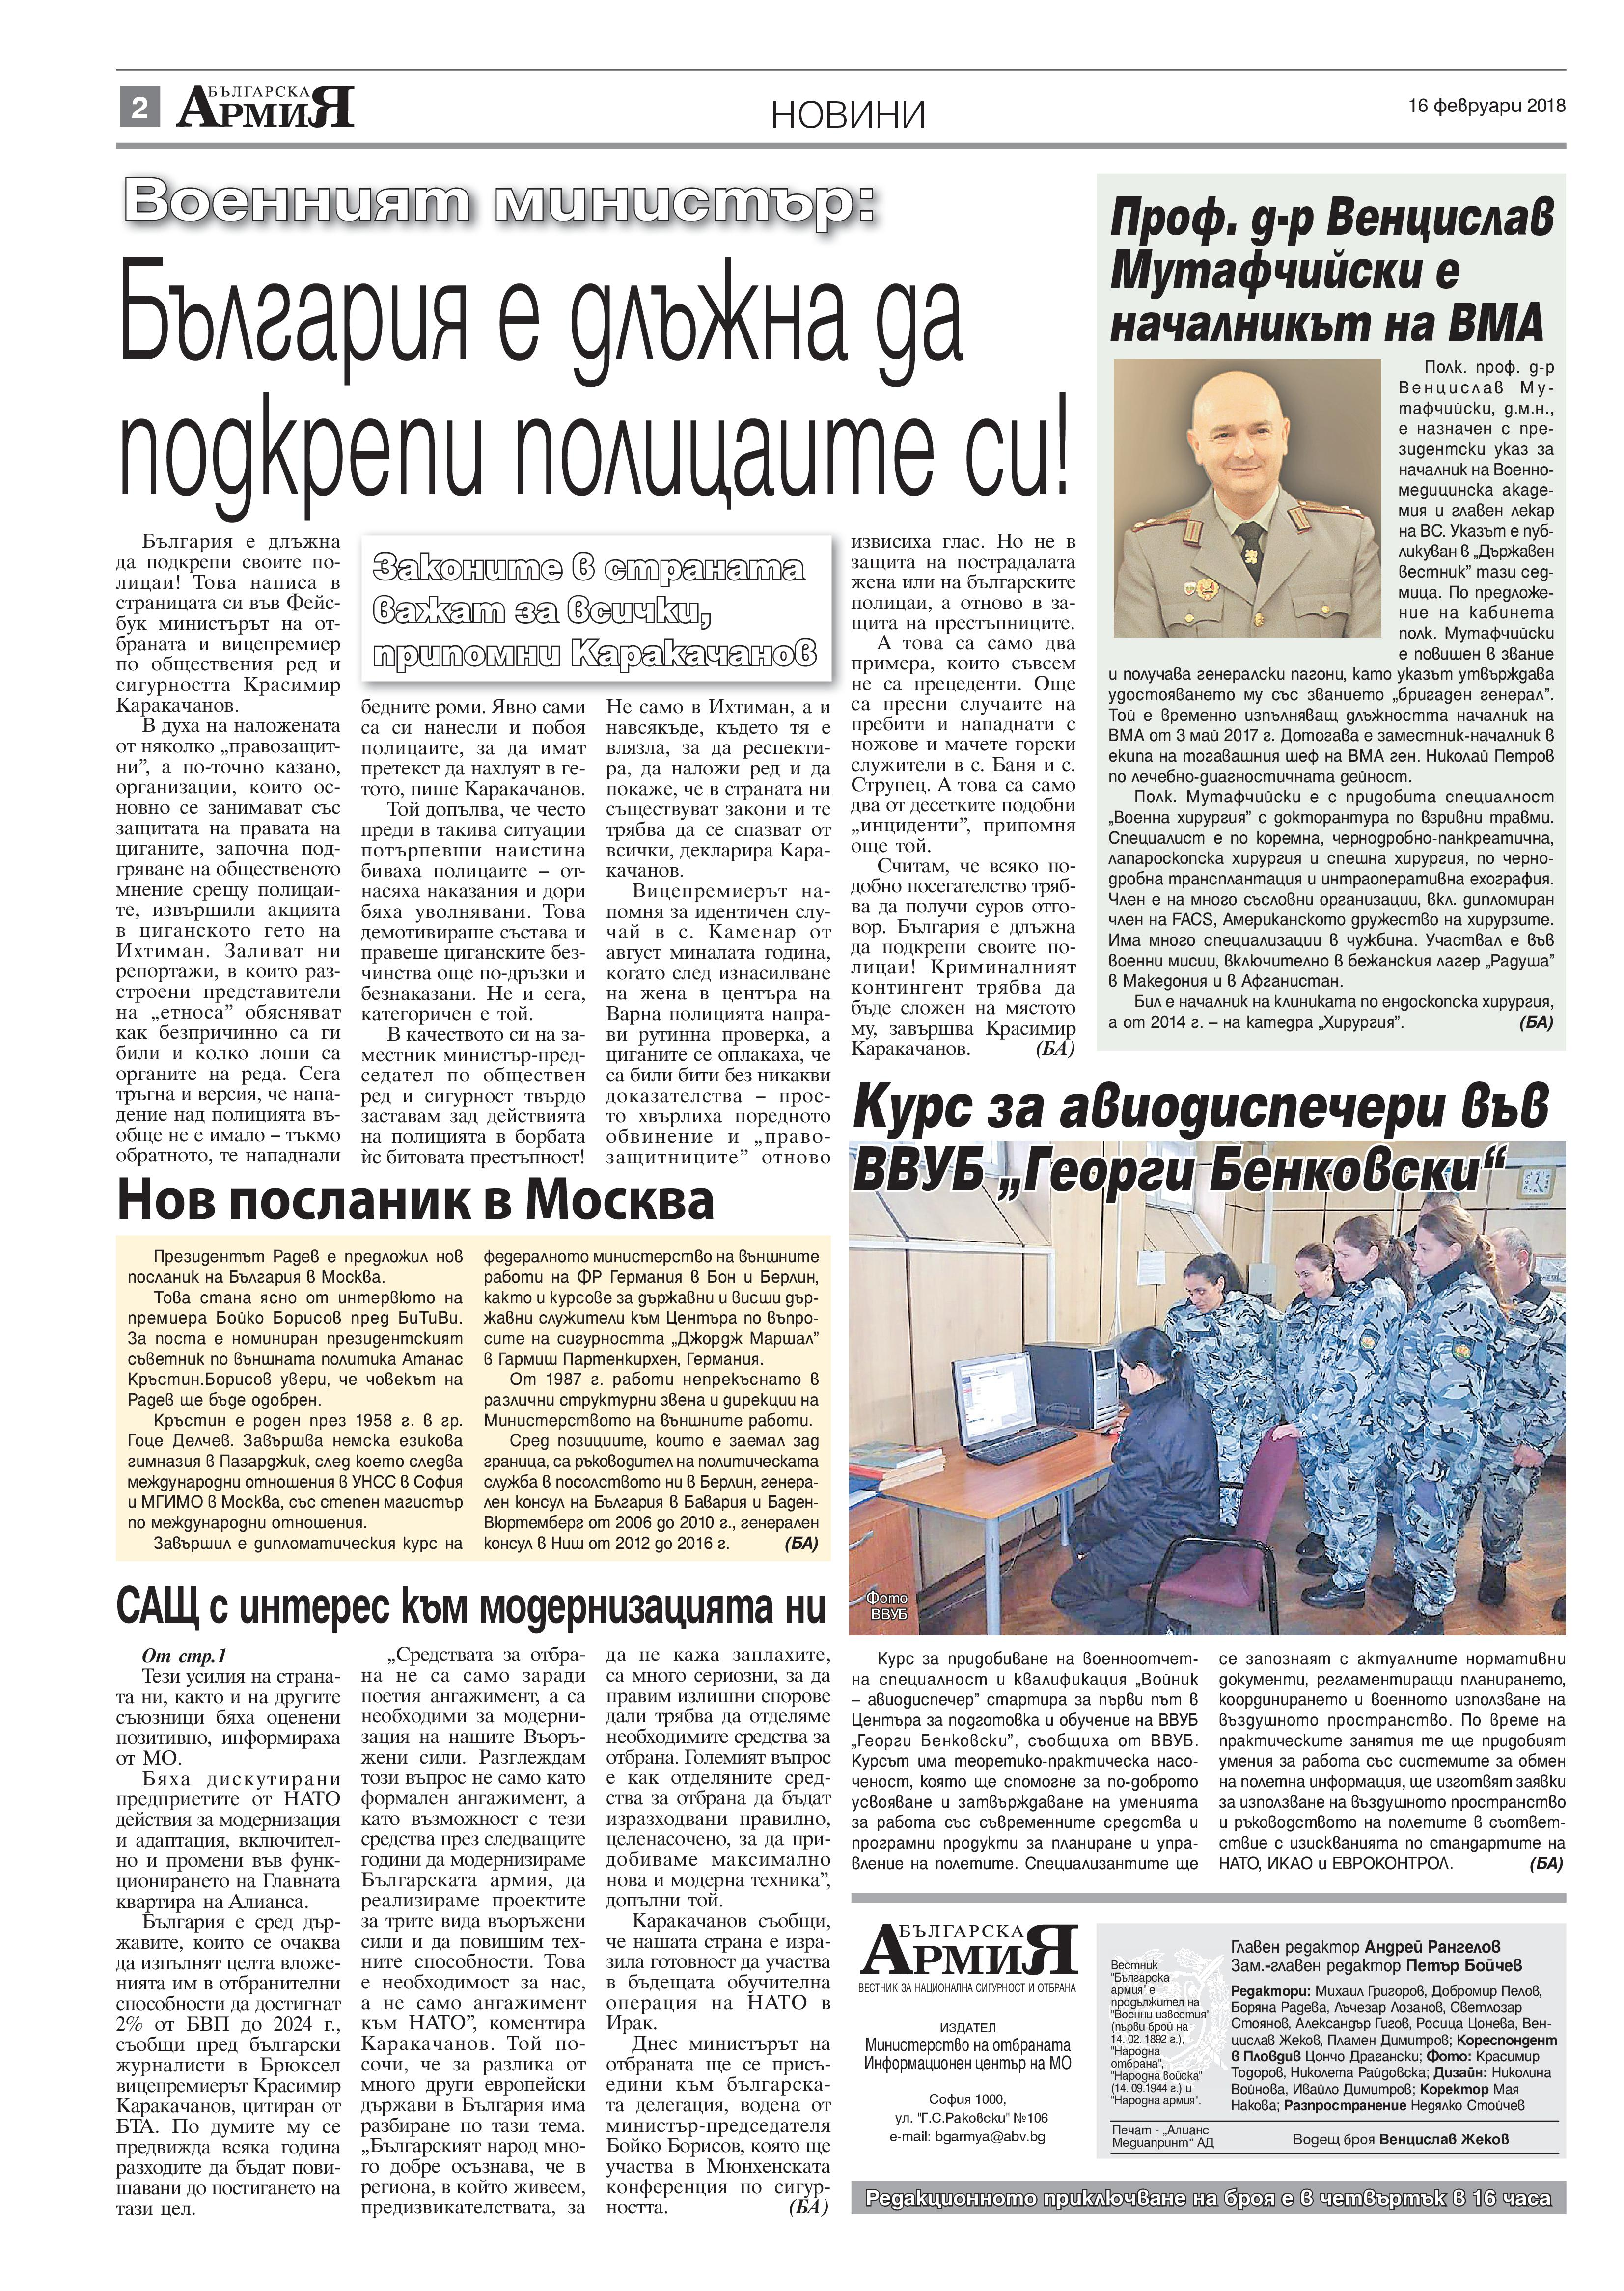 http://armymedia.bg/wp-content/uploads/2015/06/02-19.jpg